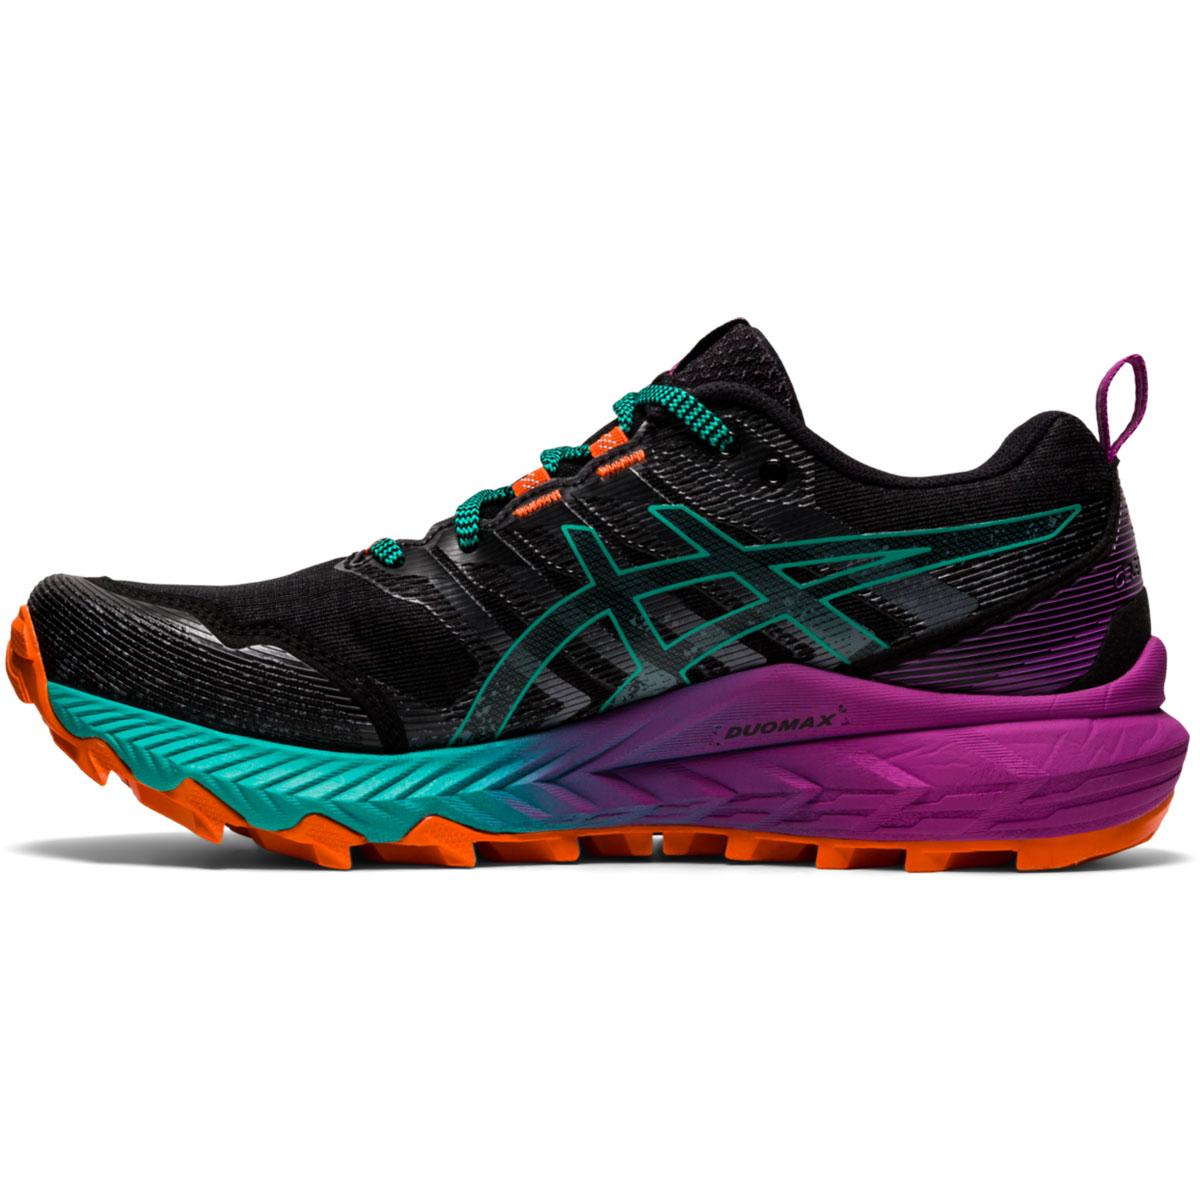 Women's Asics Gel-Trabuco 9 Running Shoe - Color: Black/Baltic Jewel - Size: 5 - Width: Regular, Black/Baltic Jewel, large, image 2